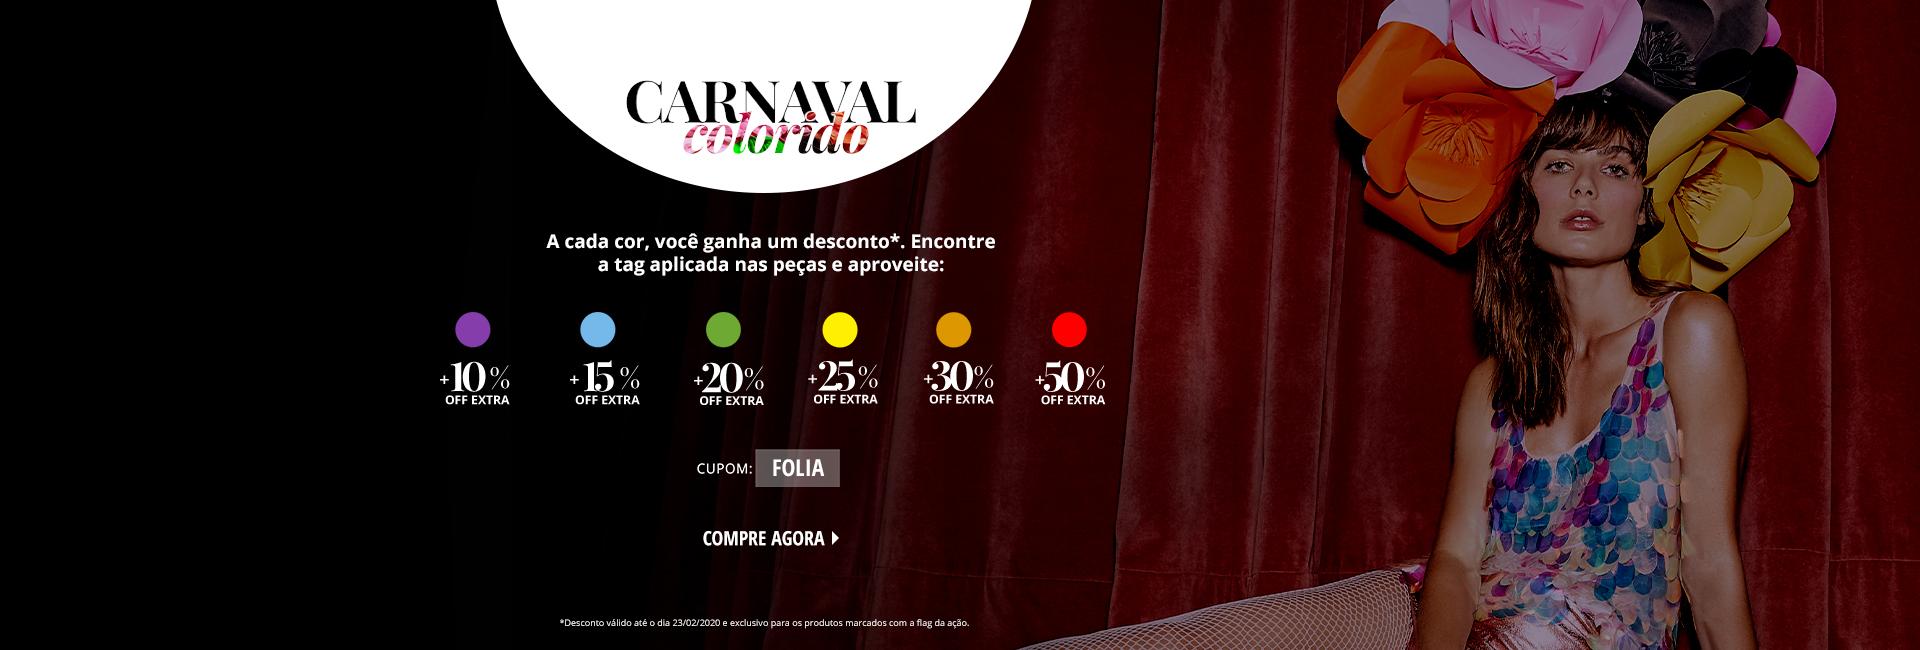 Carnaval colorido